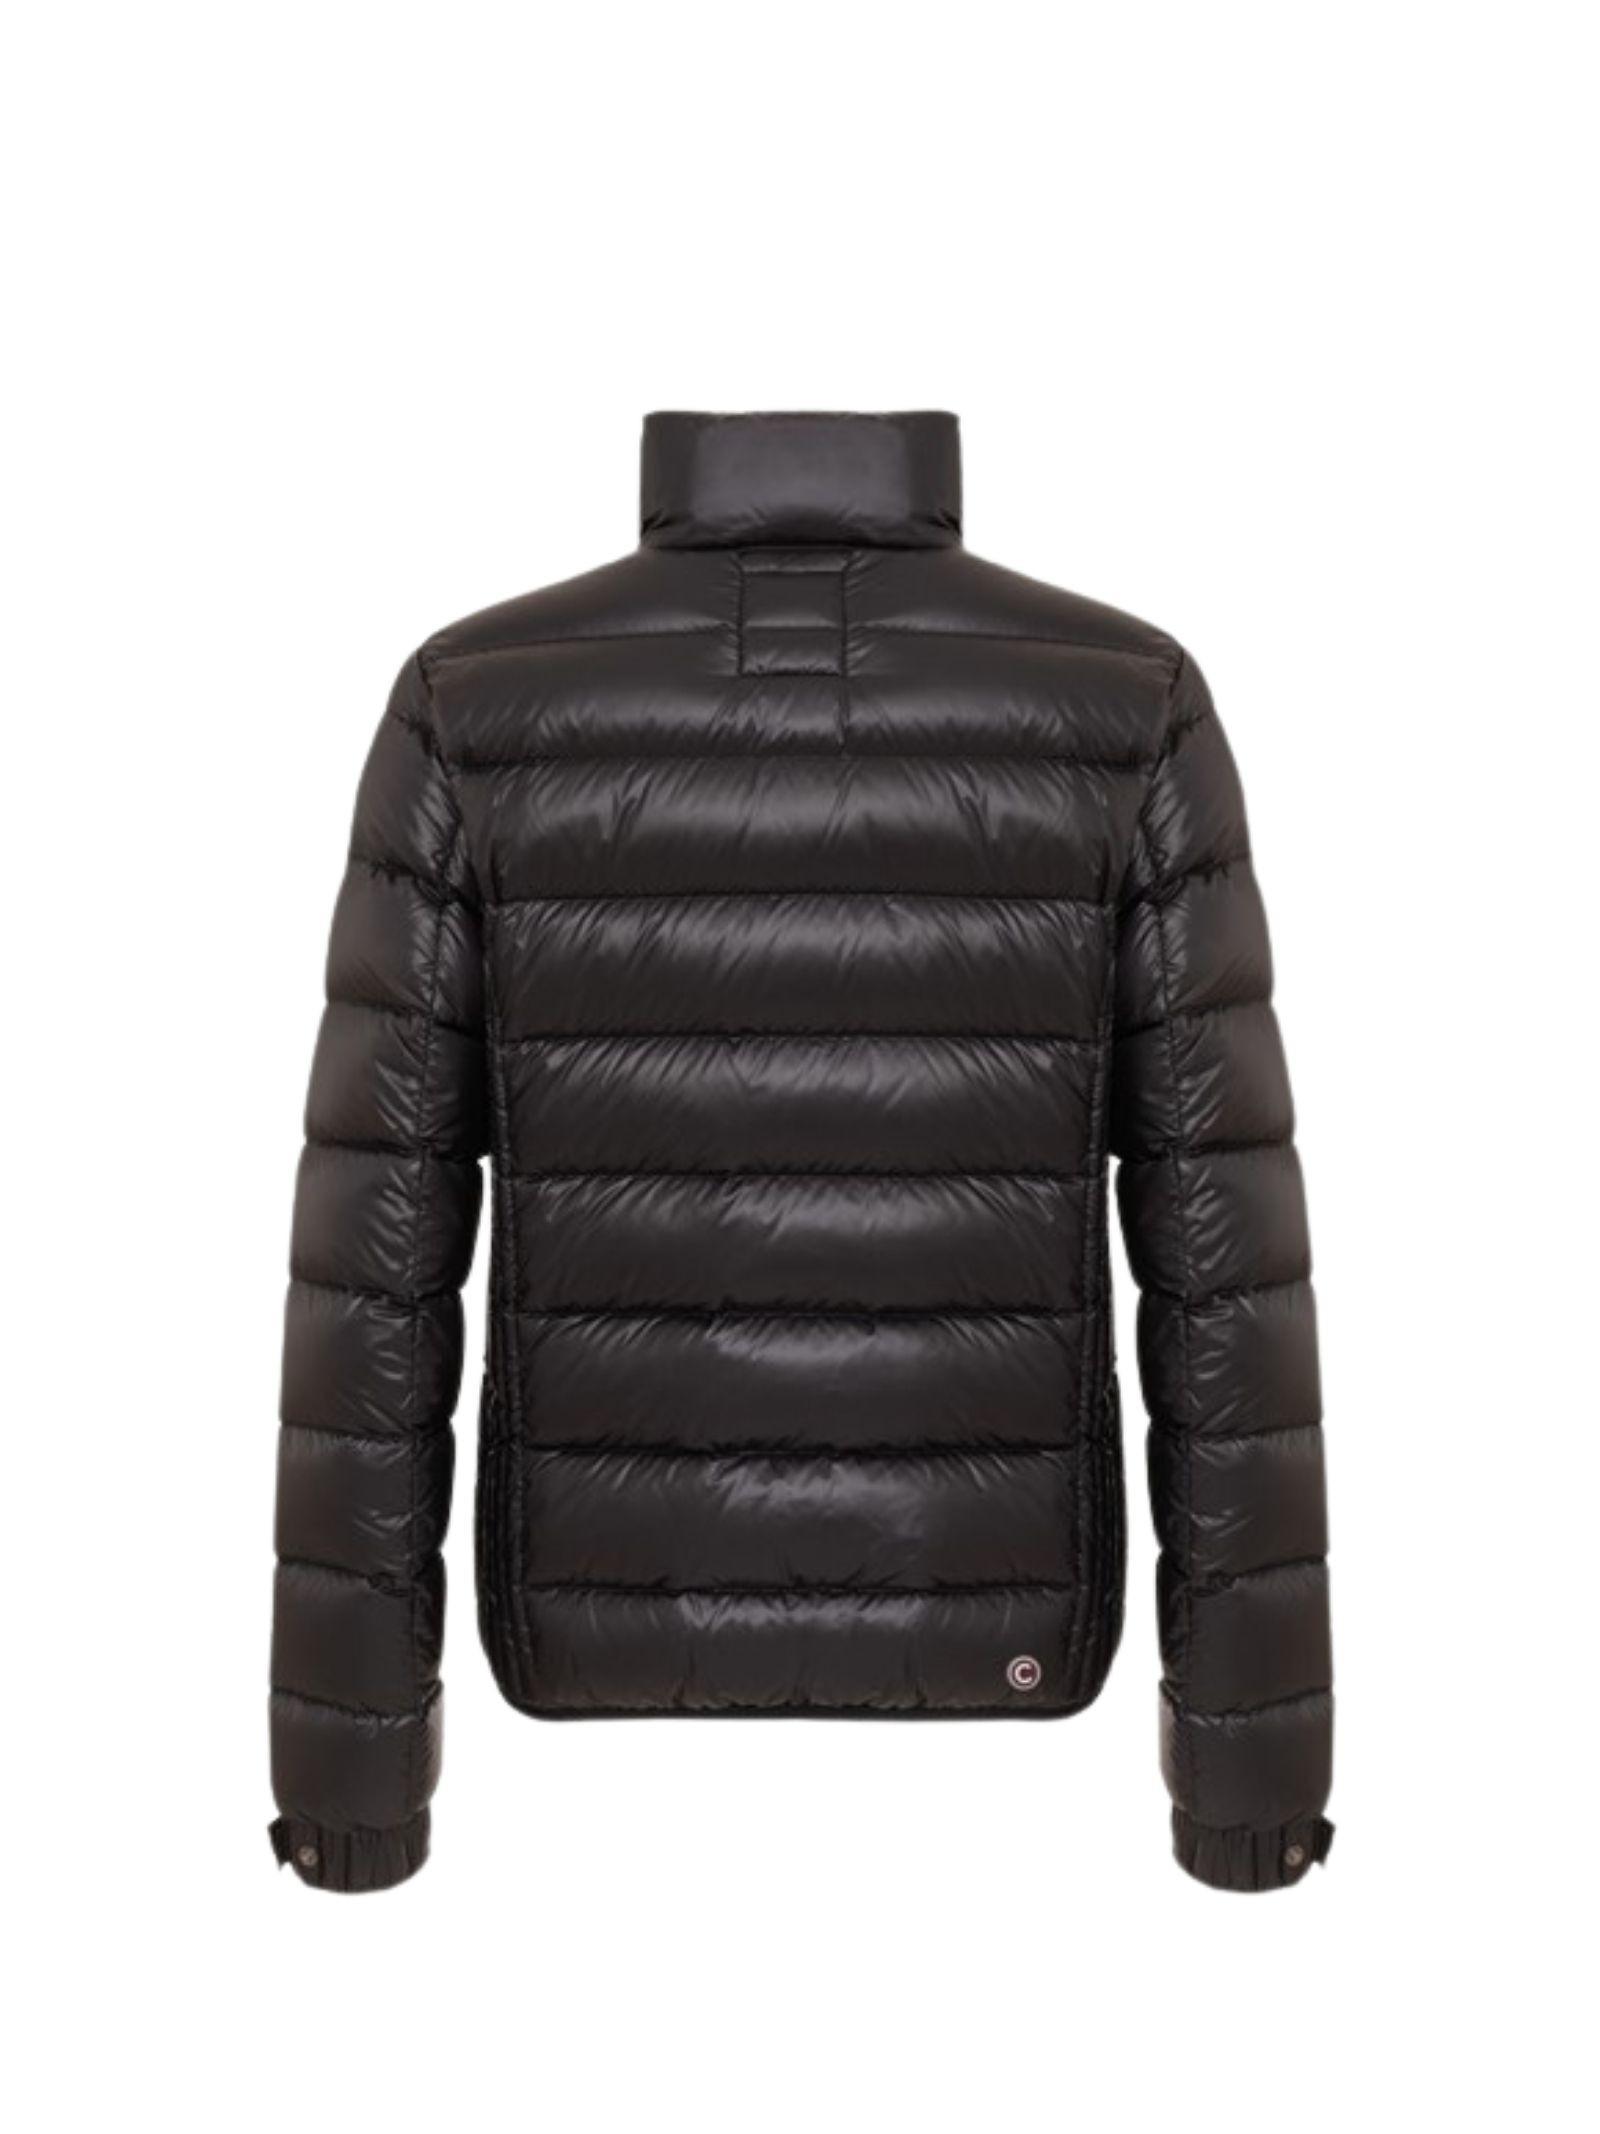 COLMAR | Jacket | 1236 3TW99